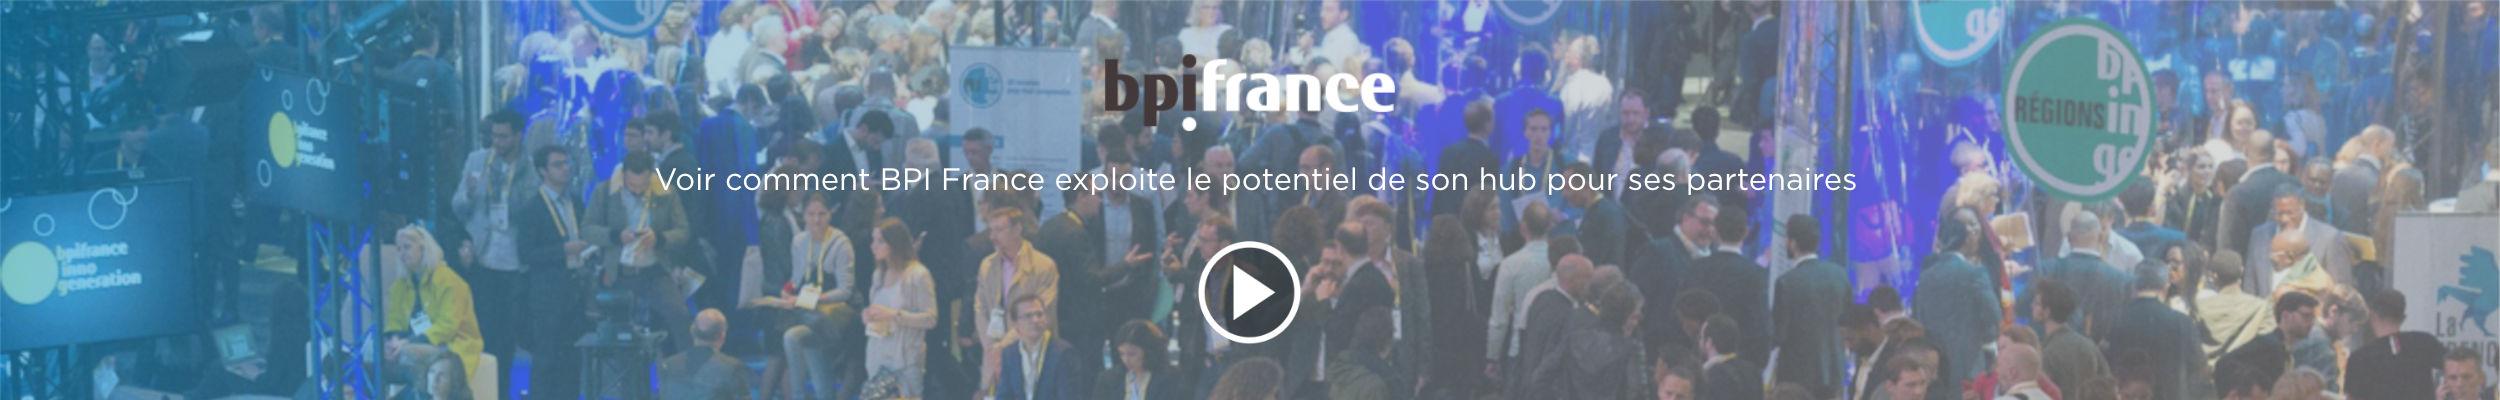 Bannière BPI.jpg